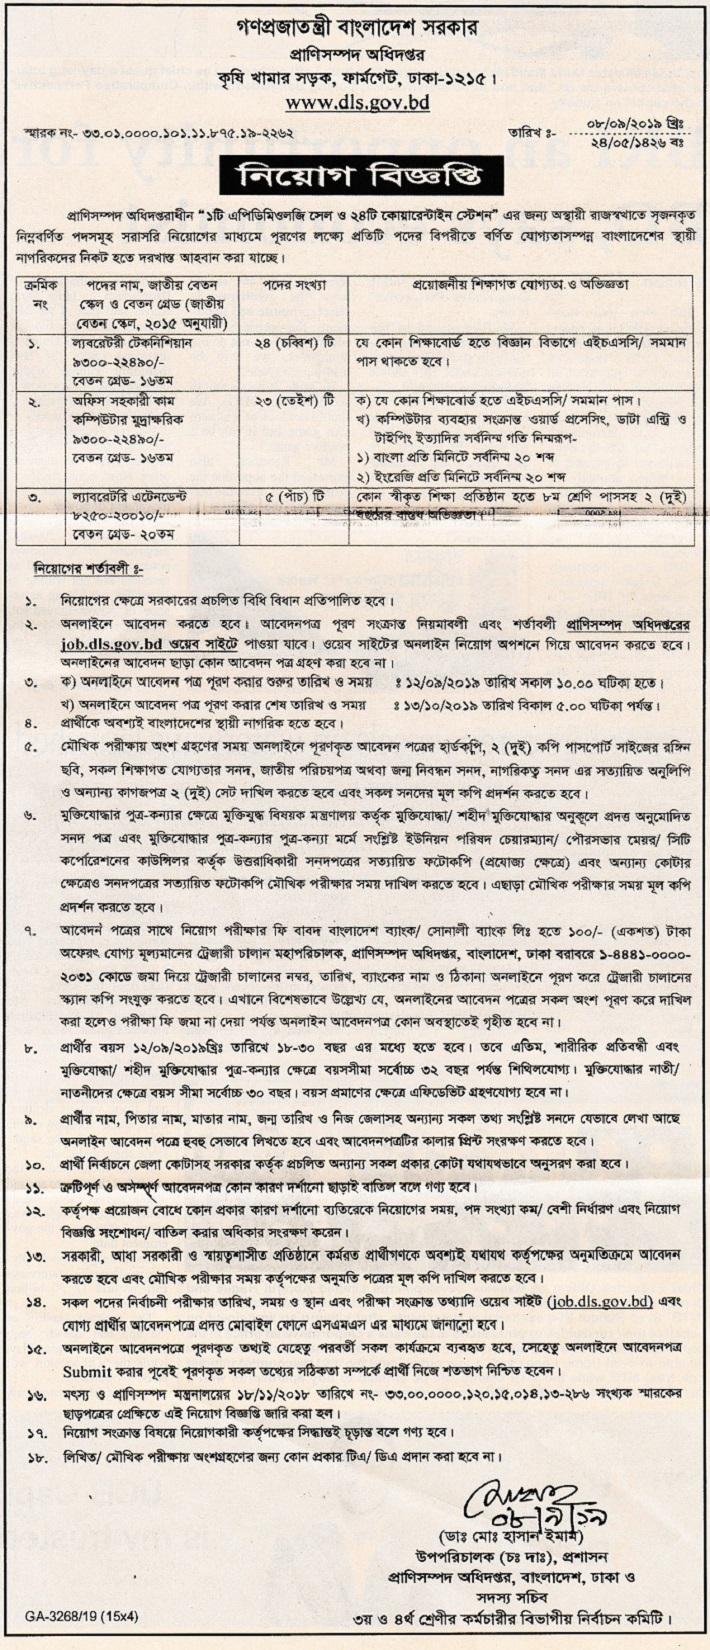 Department of Livestock Services Job Circular 2019